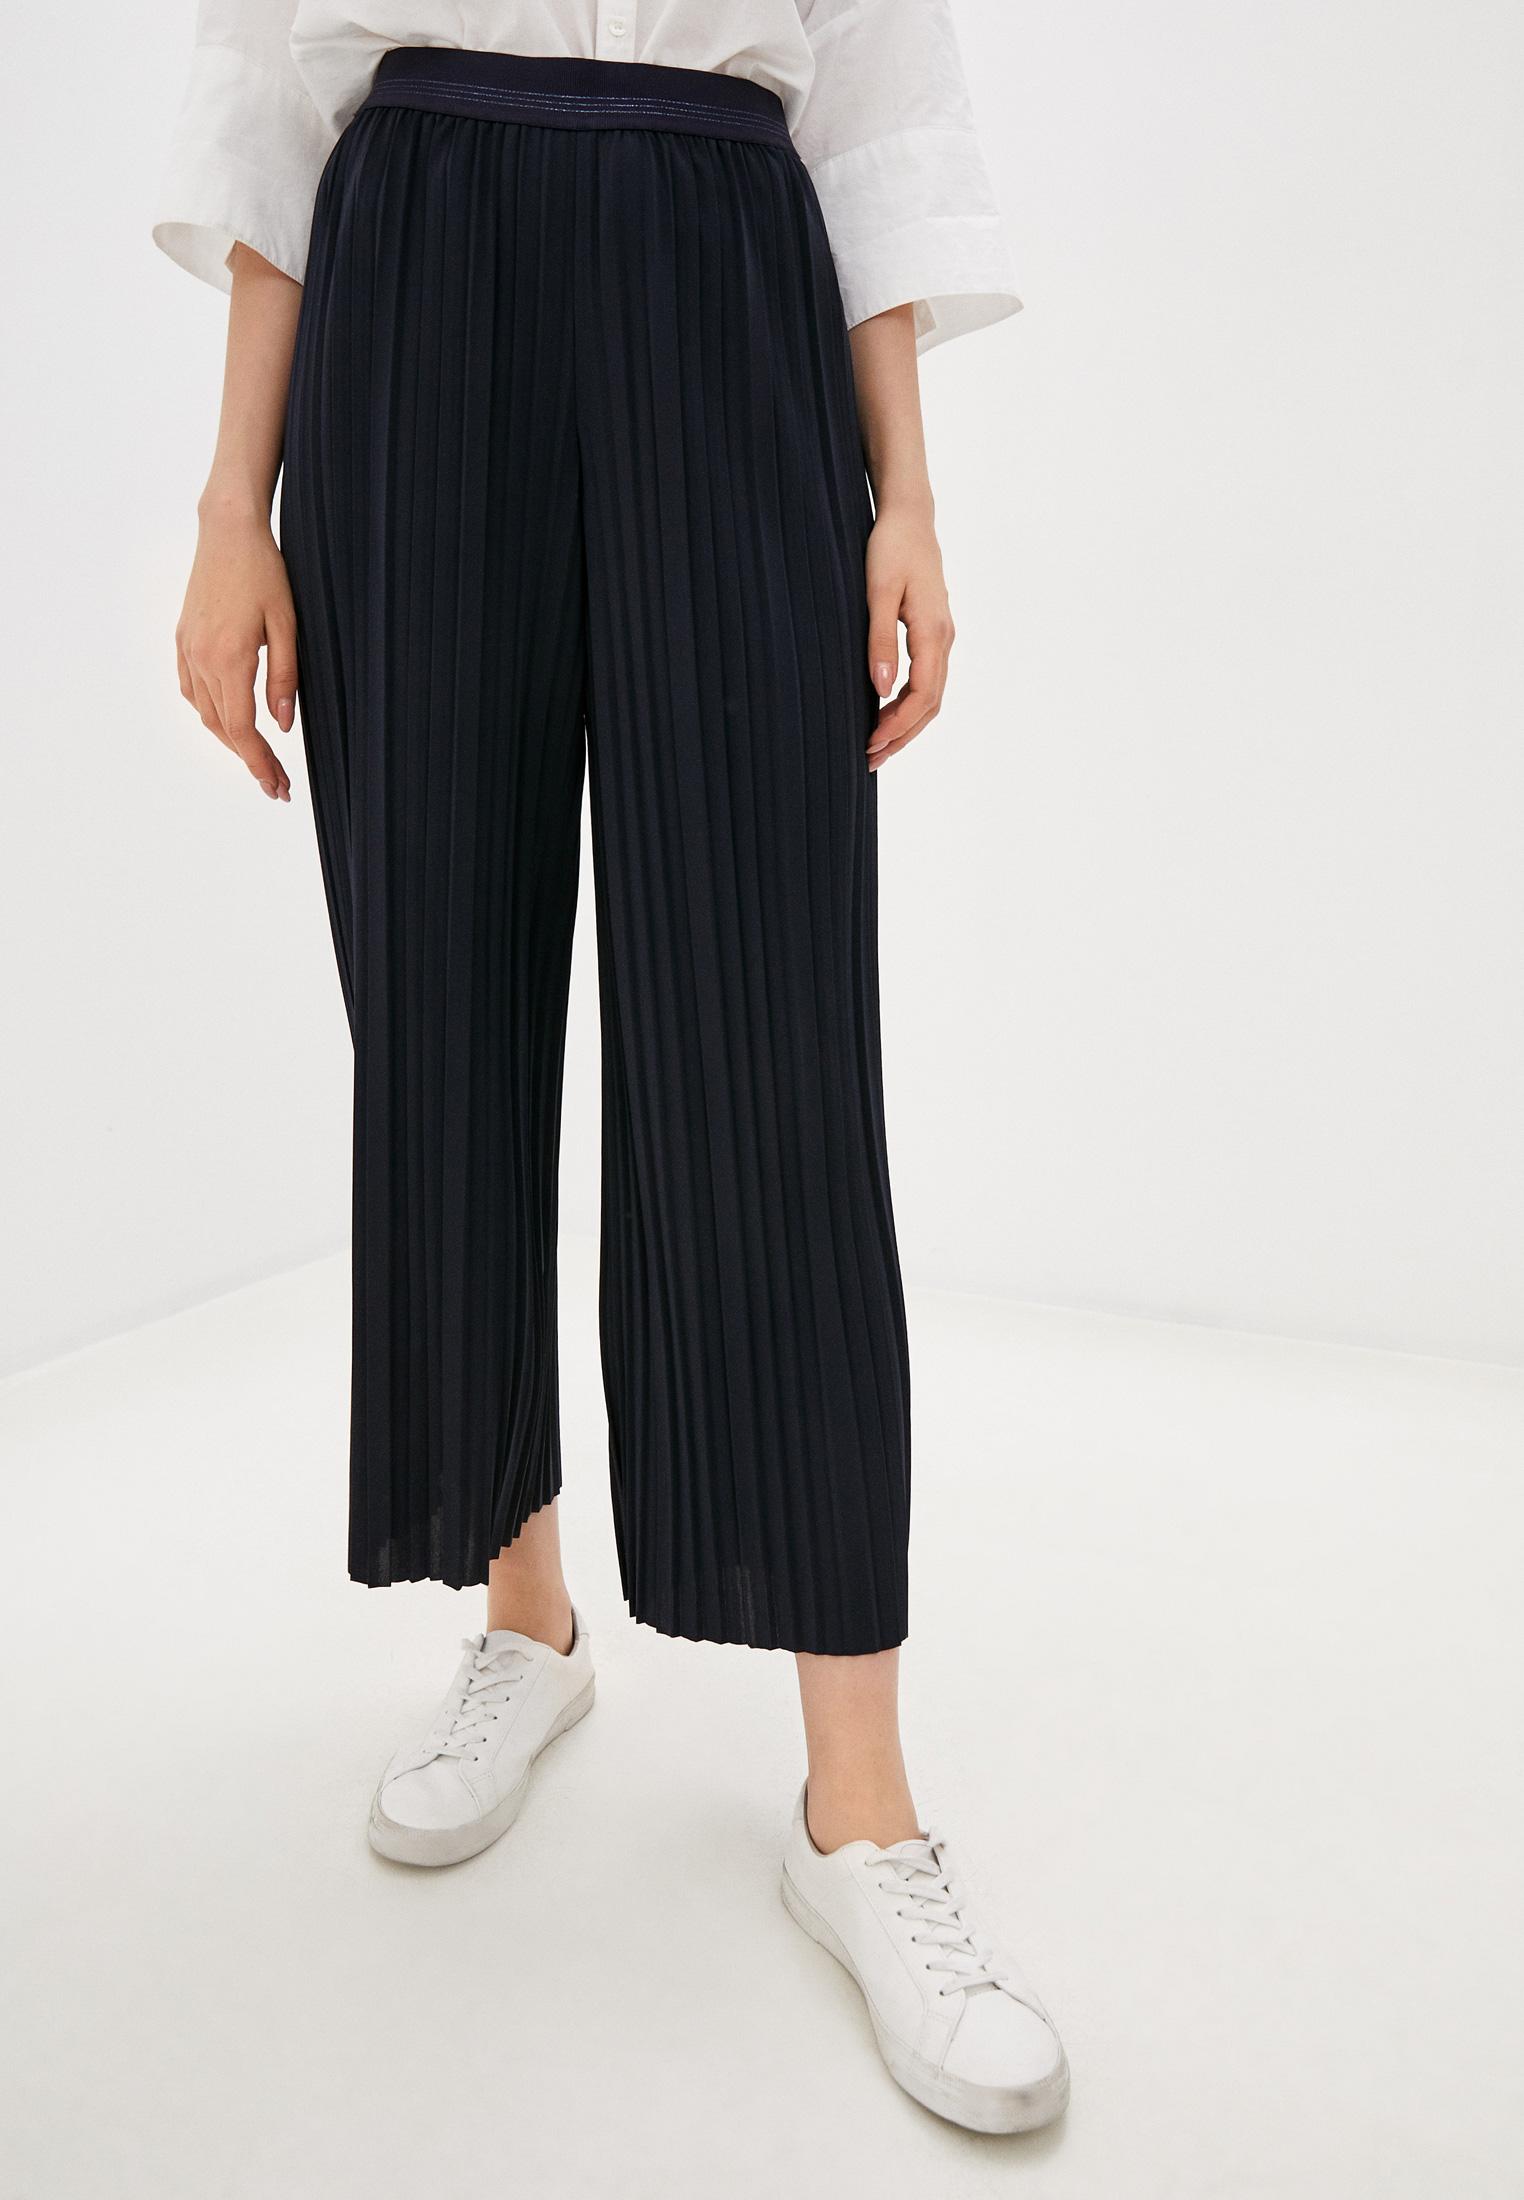 Женские прямые брюки Betty Barclay 6170/1880